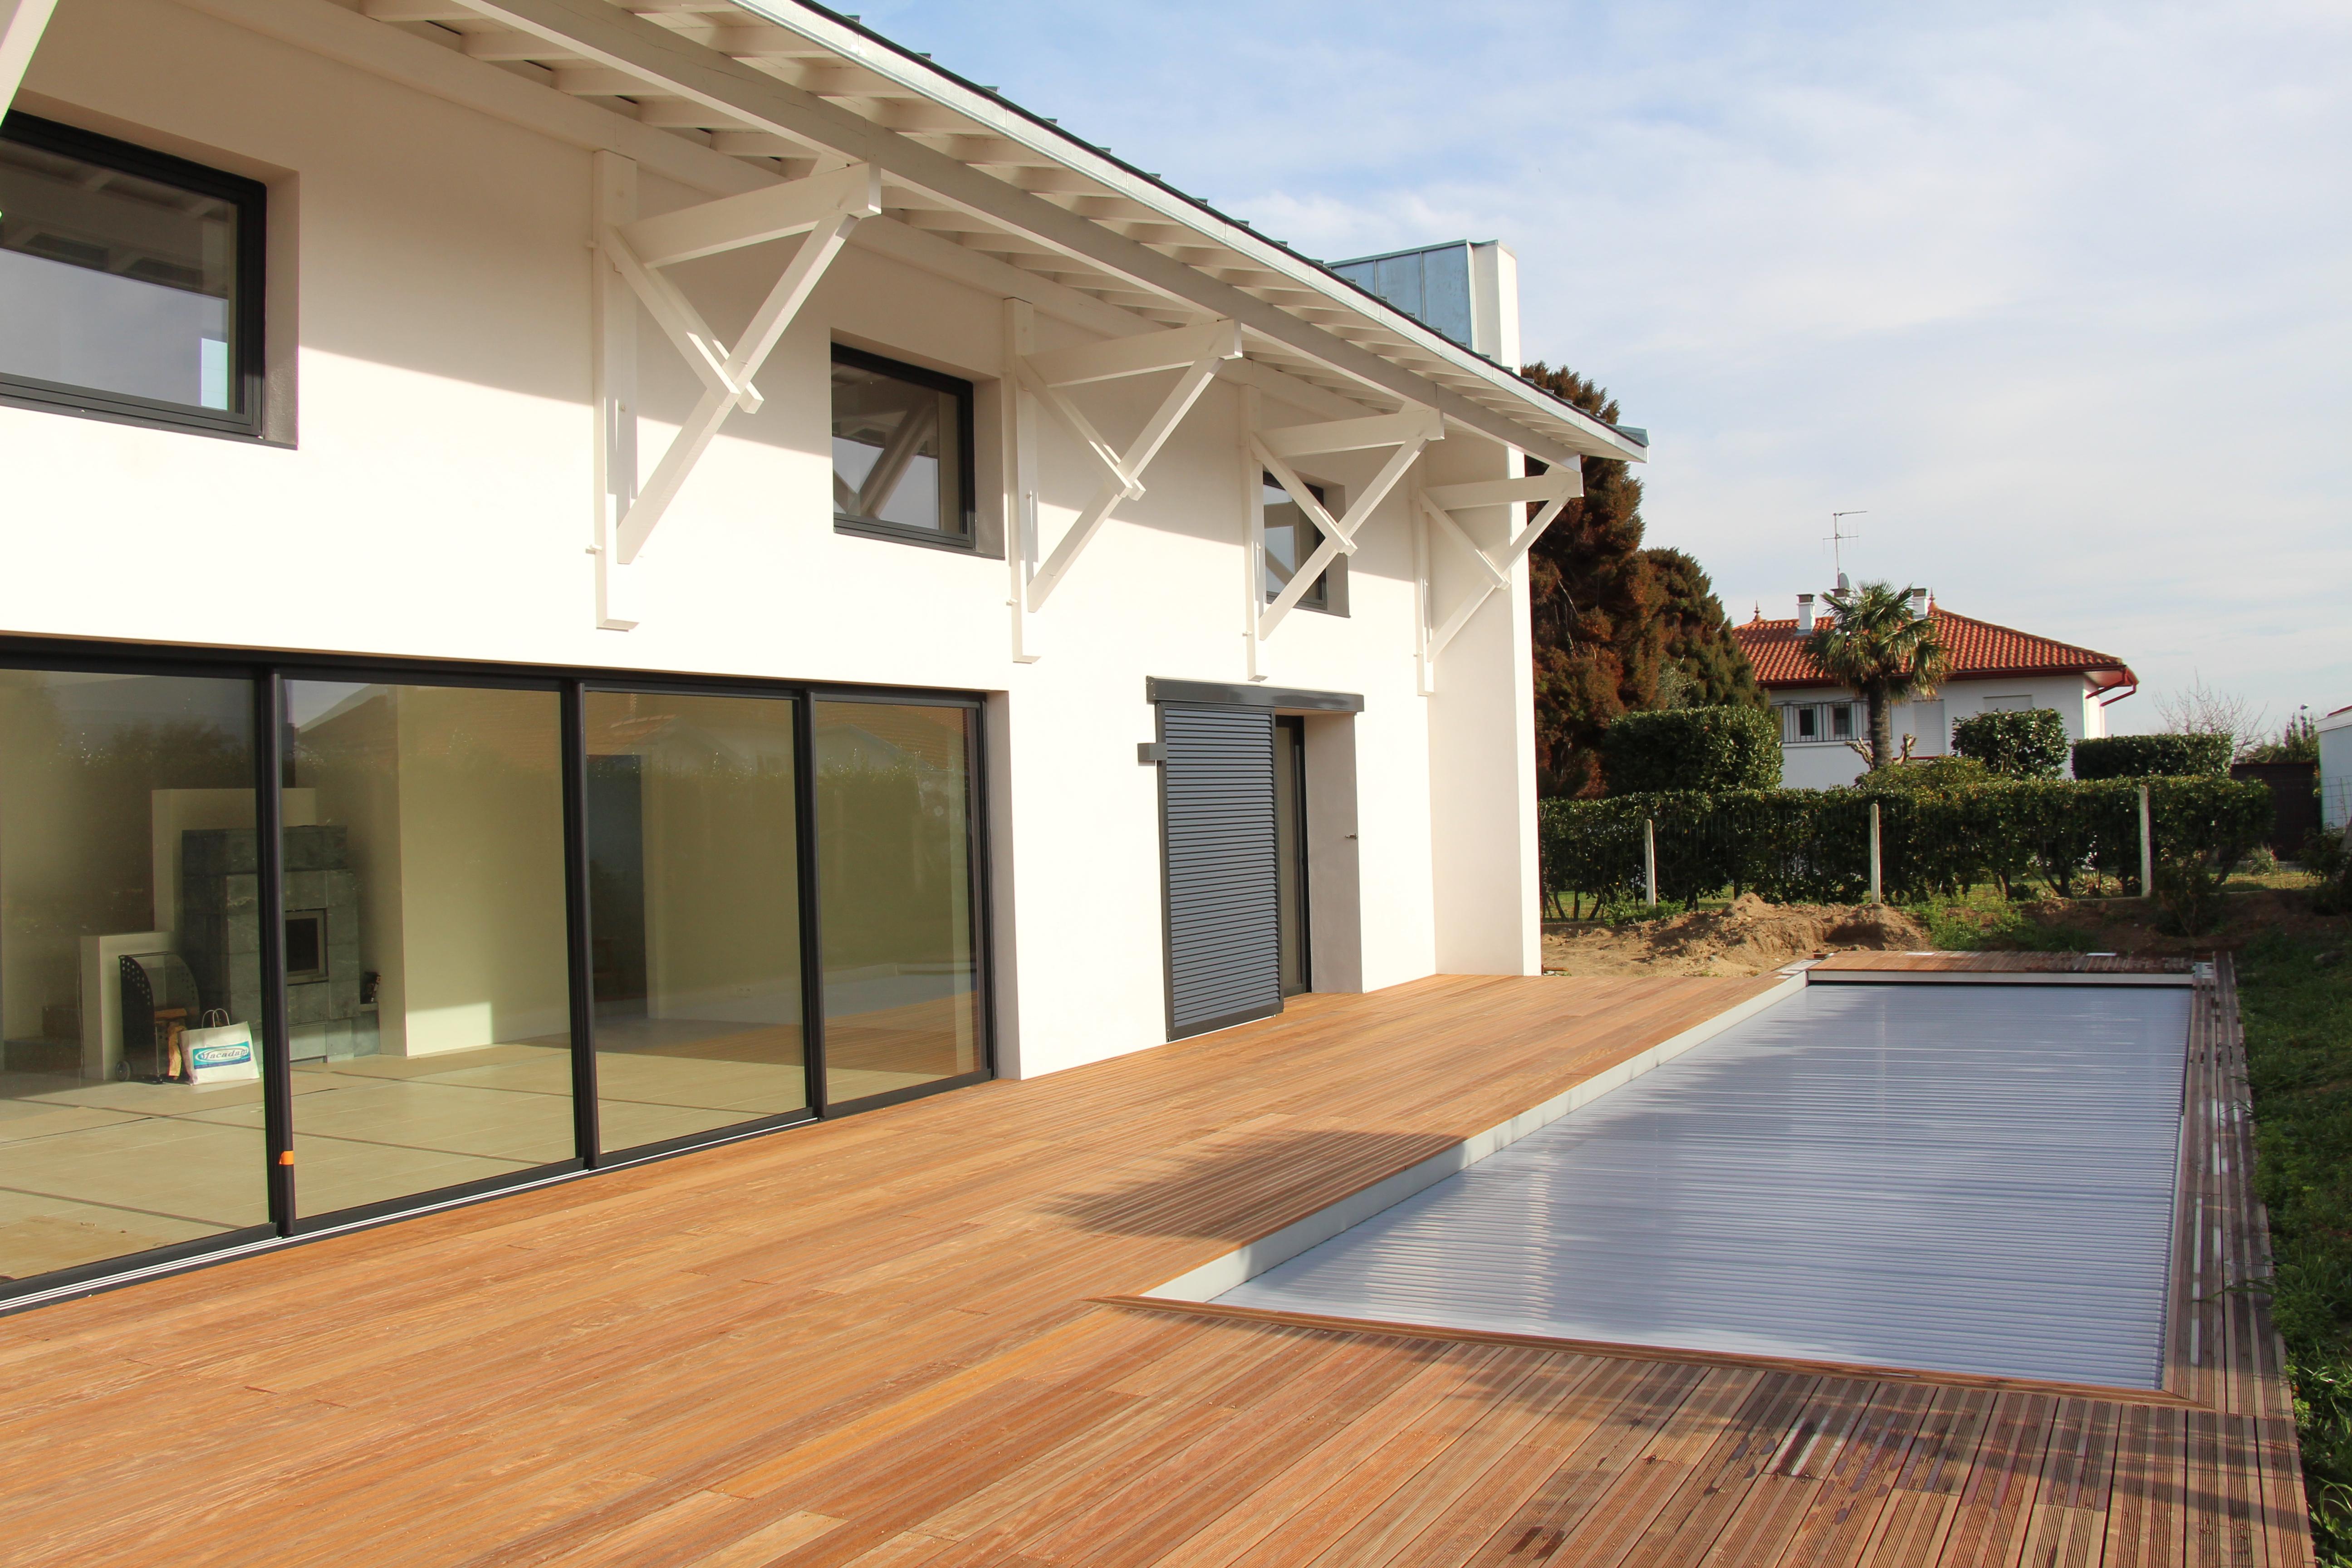 stephan architecte maison cologique anglet. Black Bedroom Furniture Sets. Home Design Ideas